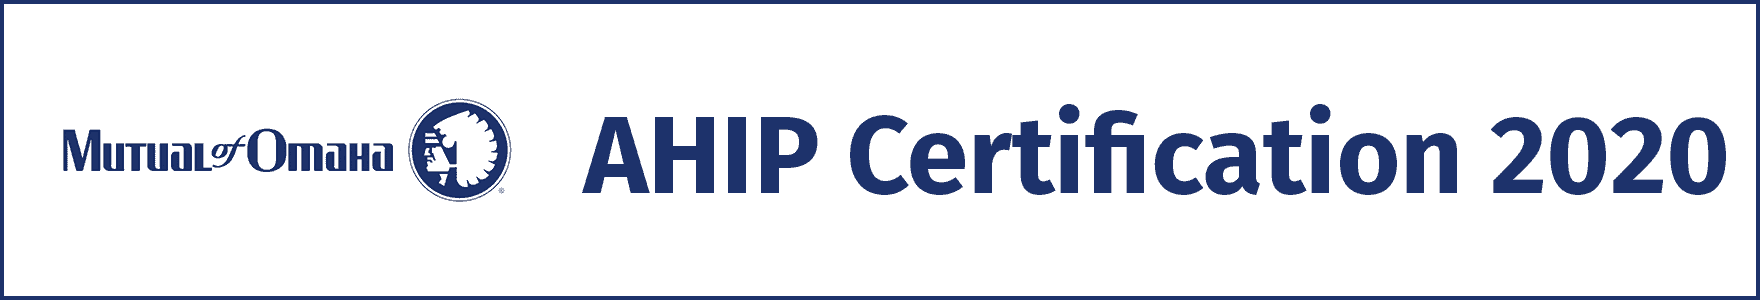 Mutual of Omaha AHIP Certification 2020